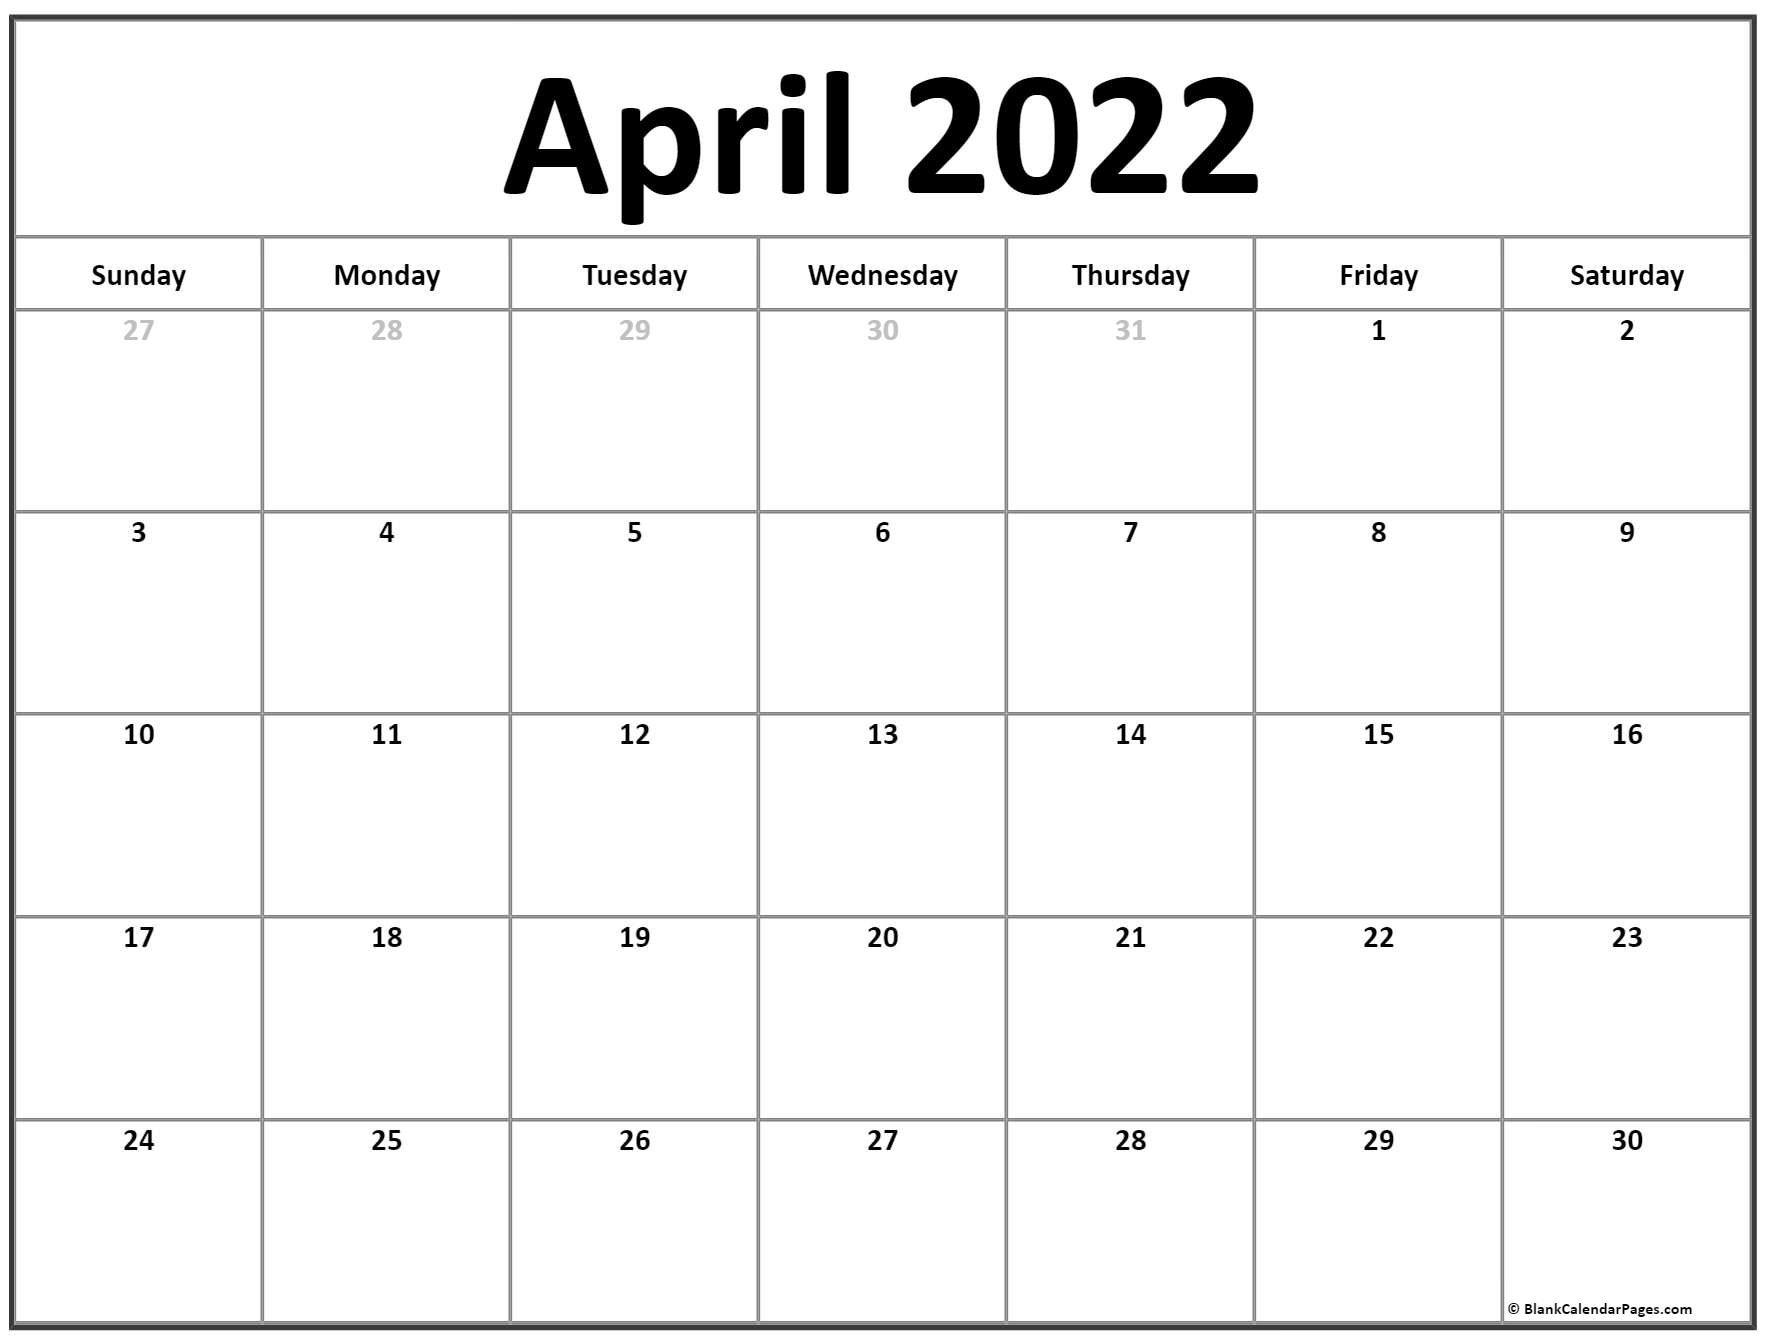 April 2022 Calendar   Free Printable Calendar Templates for April May Calendar 2022 Printable Graphics